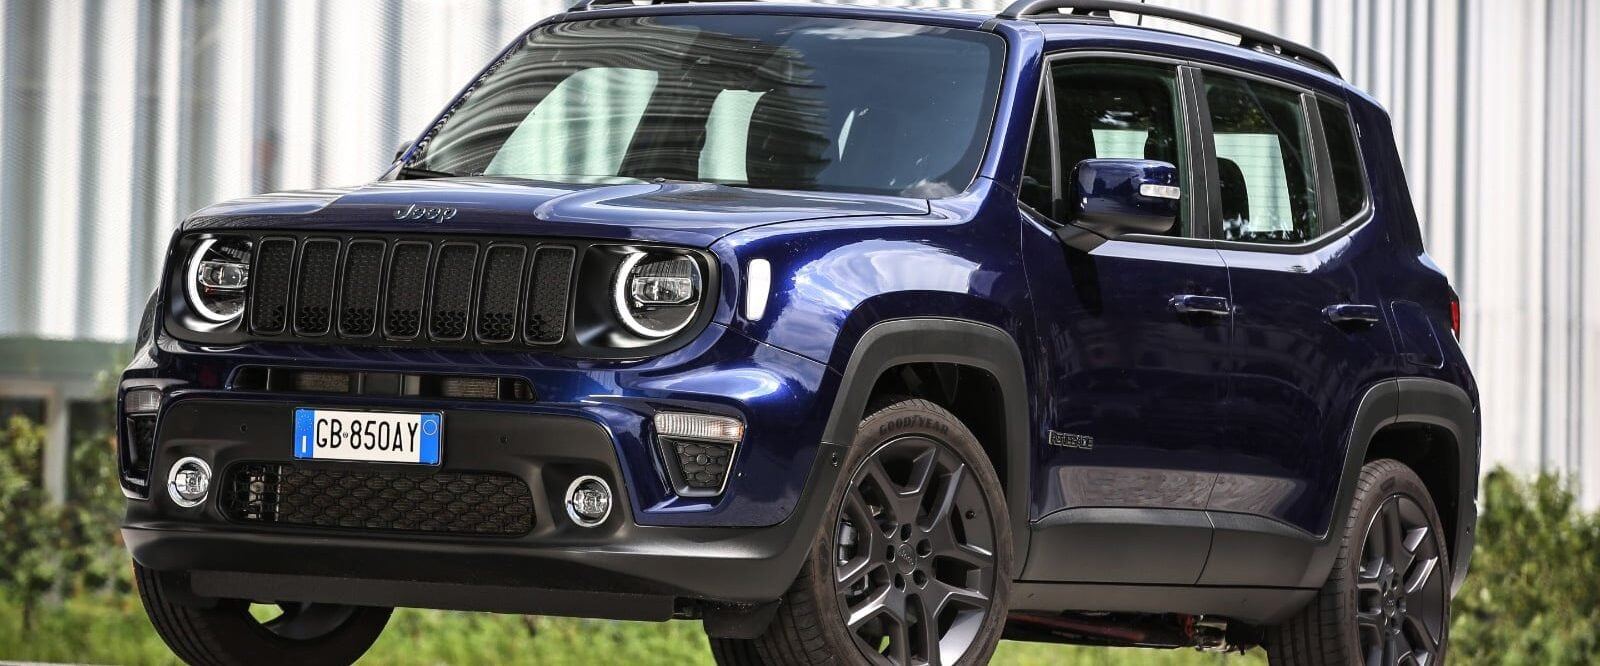 jeep-renegade-elettrica